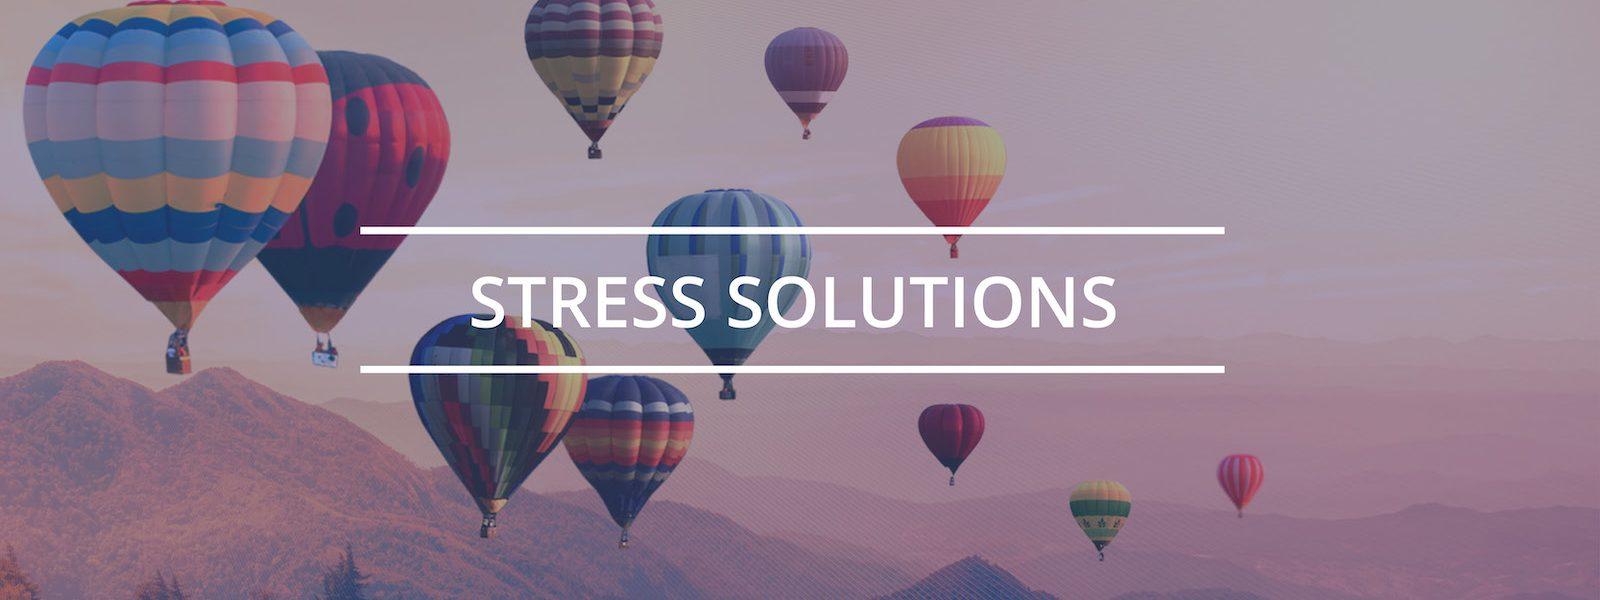 help with stress calmness illness health